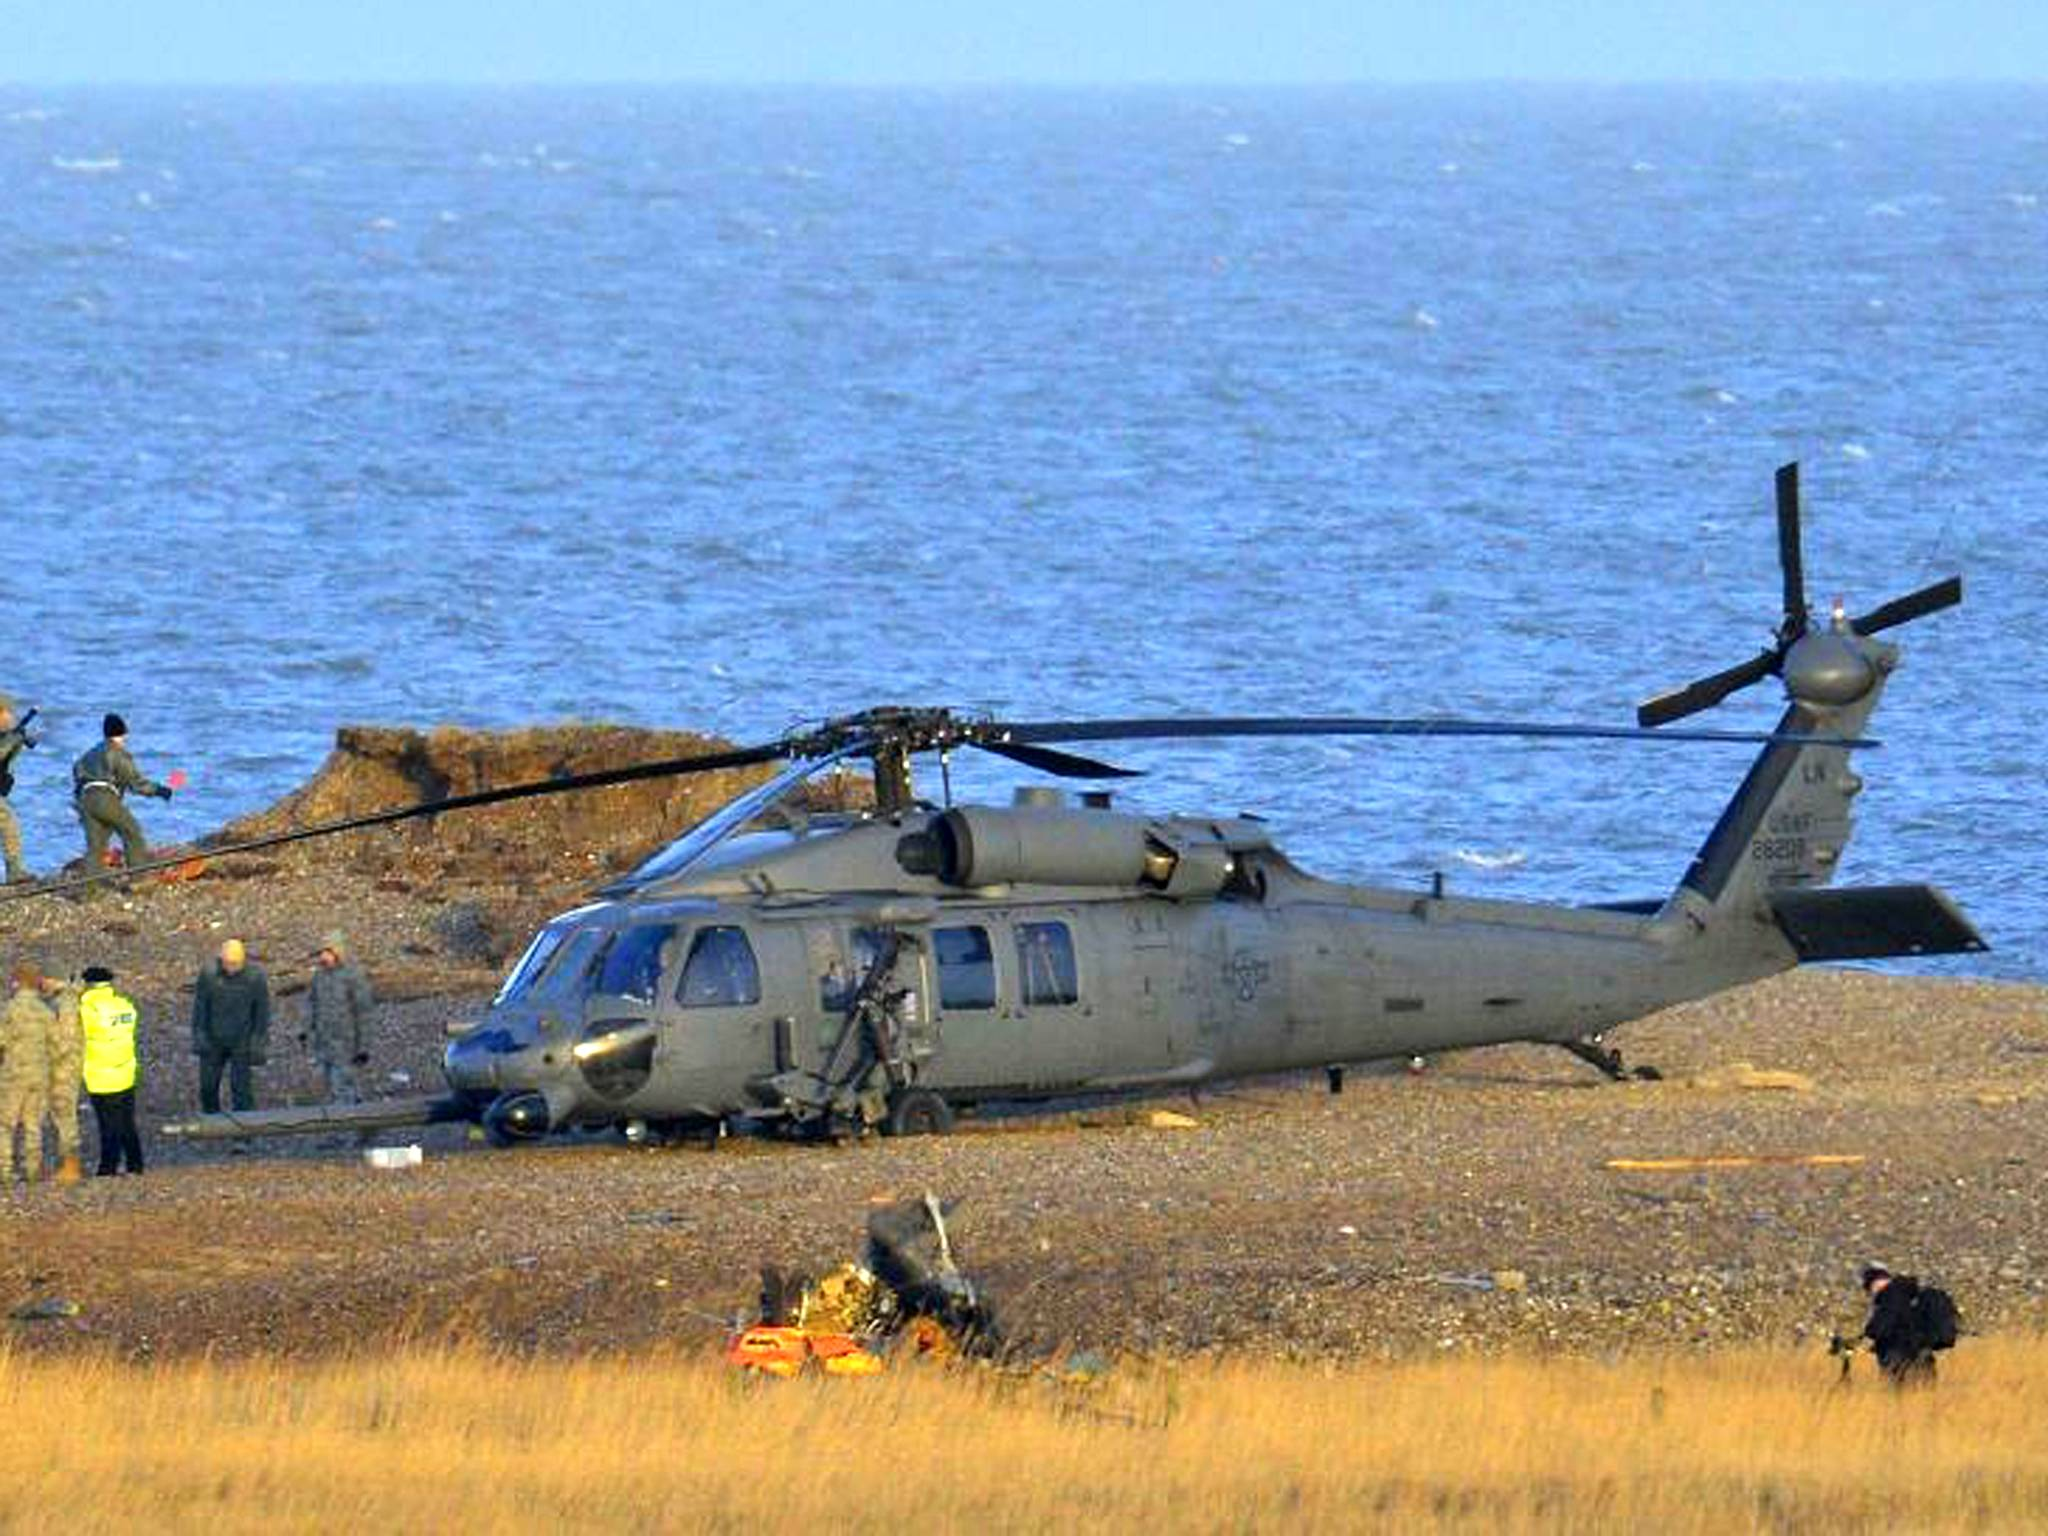 Norfolk helicopter crash: Investigation launched into how 'safest